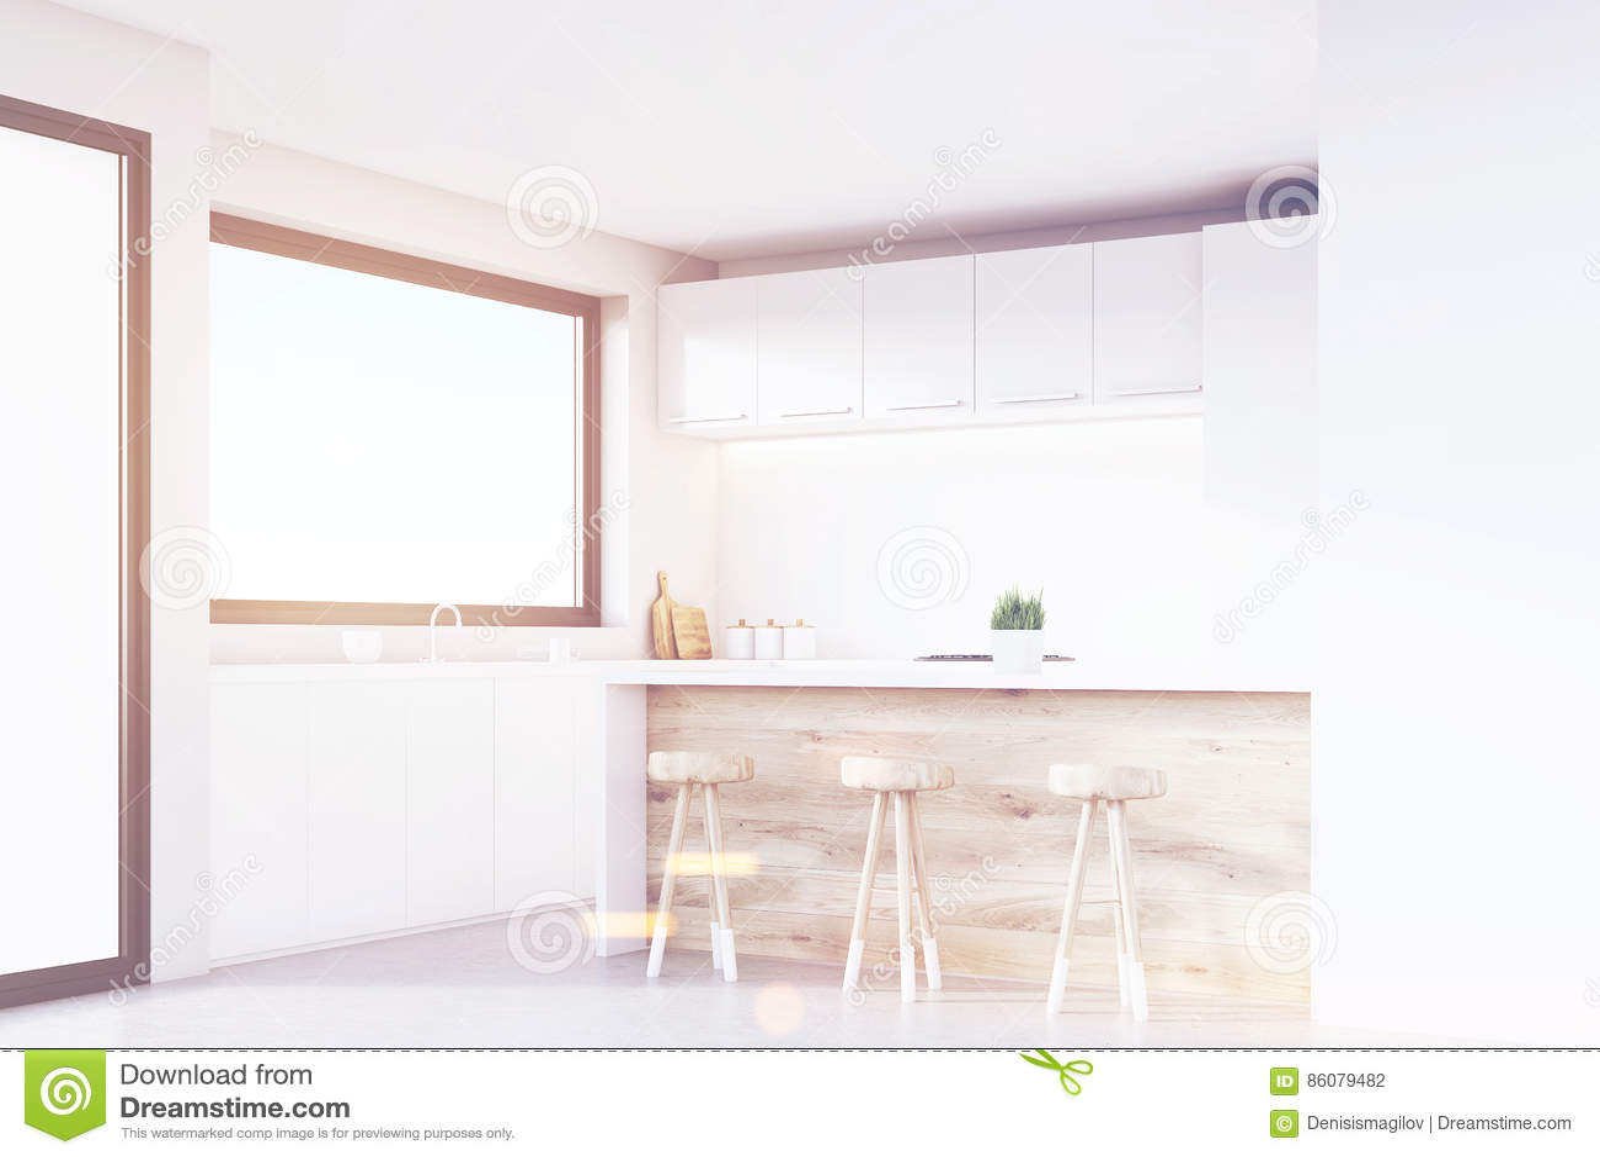 Ecke Der Küche Helles Holz Getont Stock Abbildung Illustration